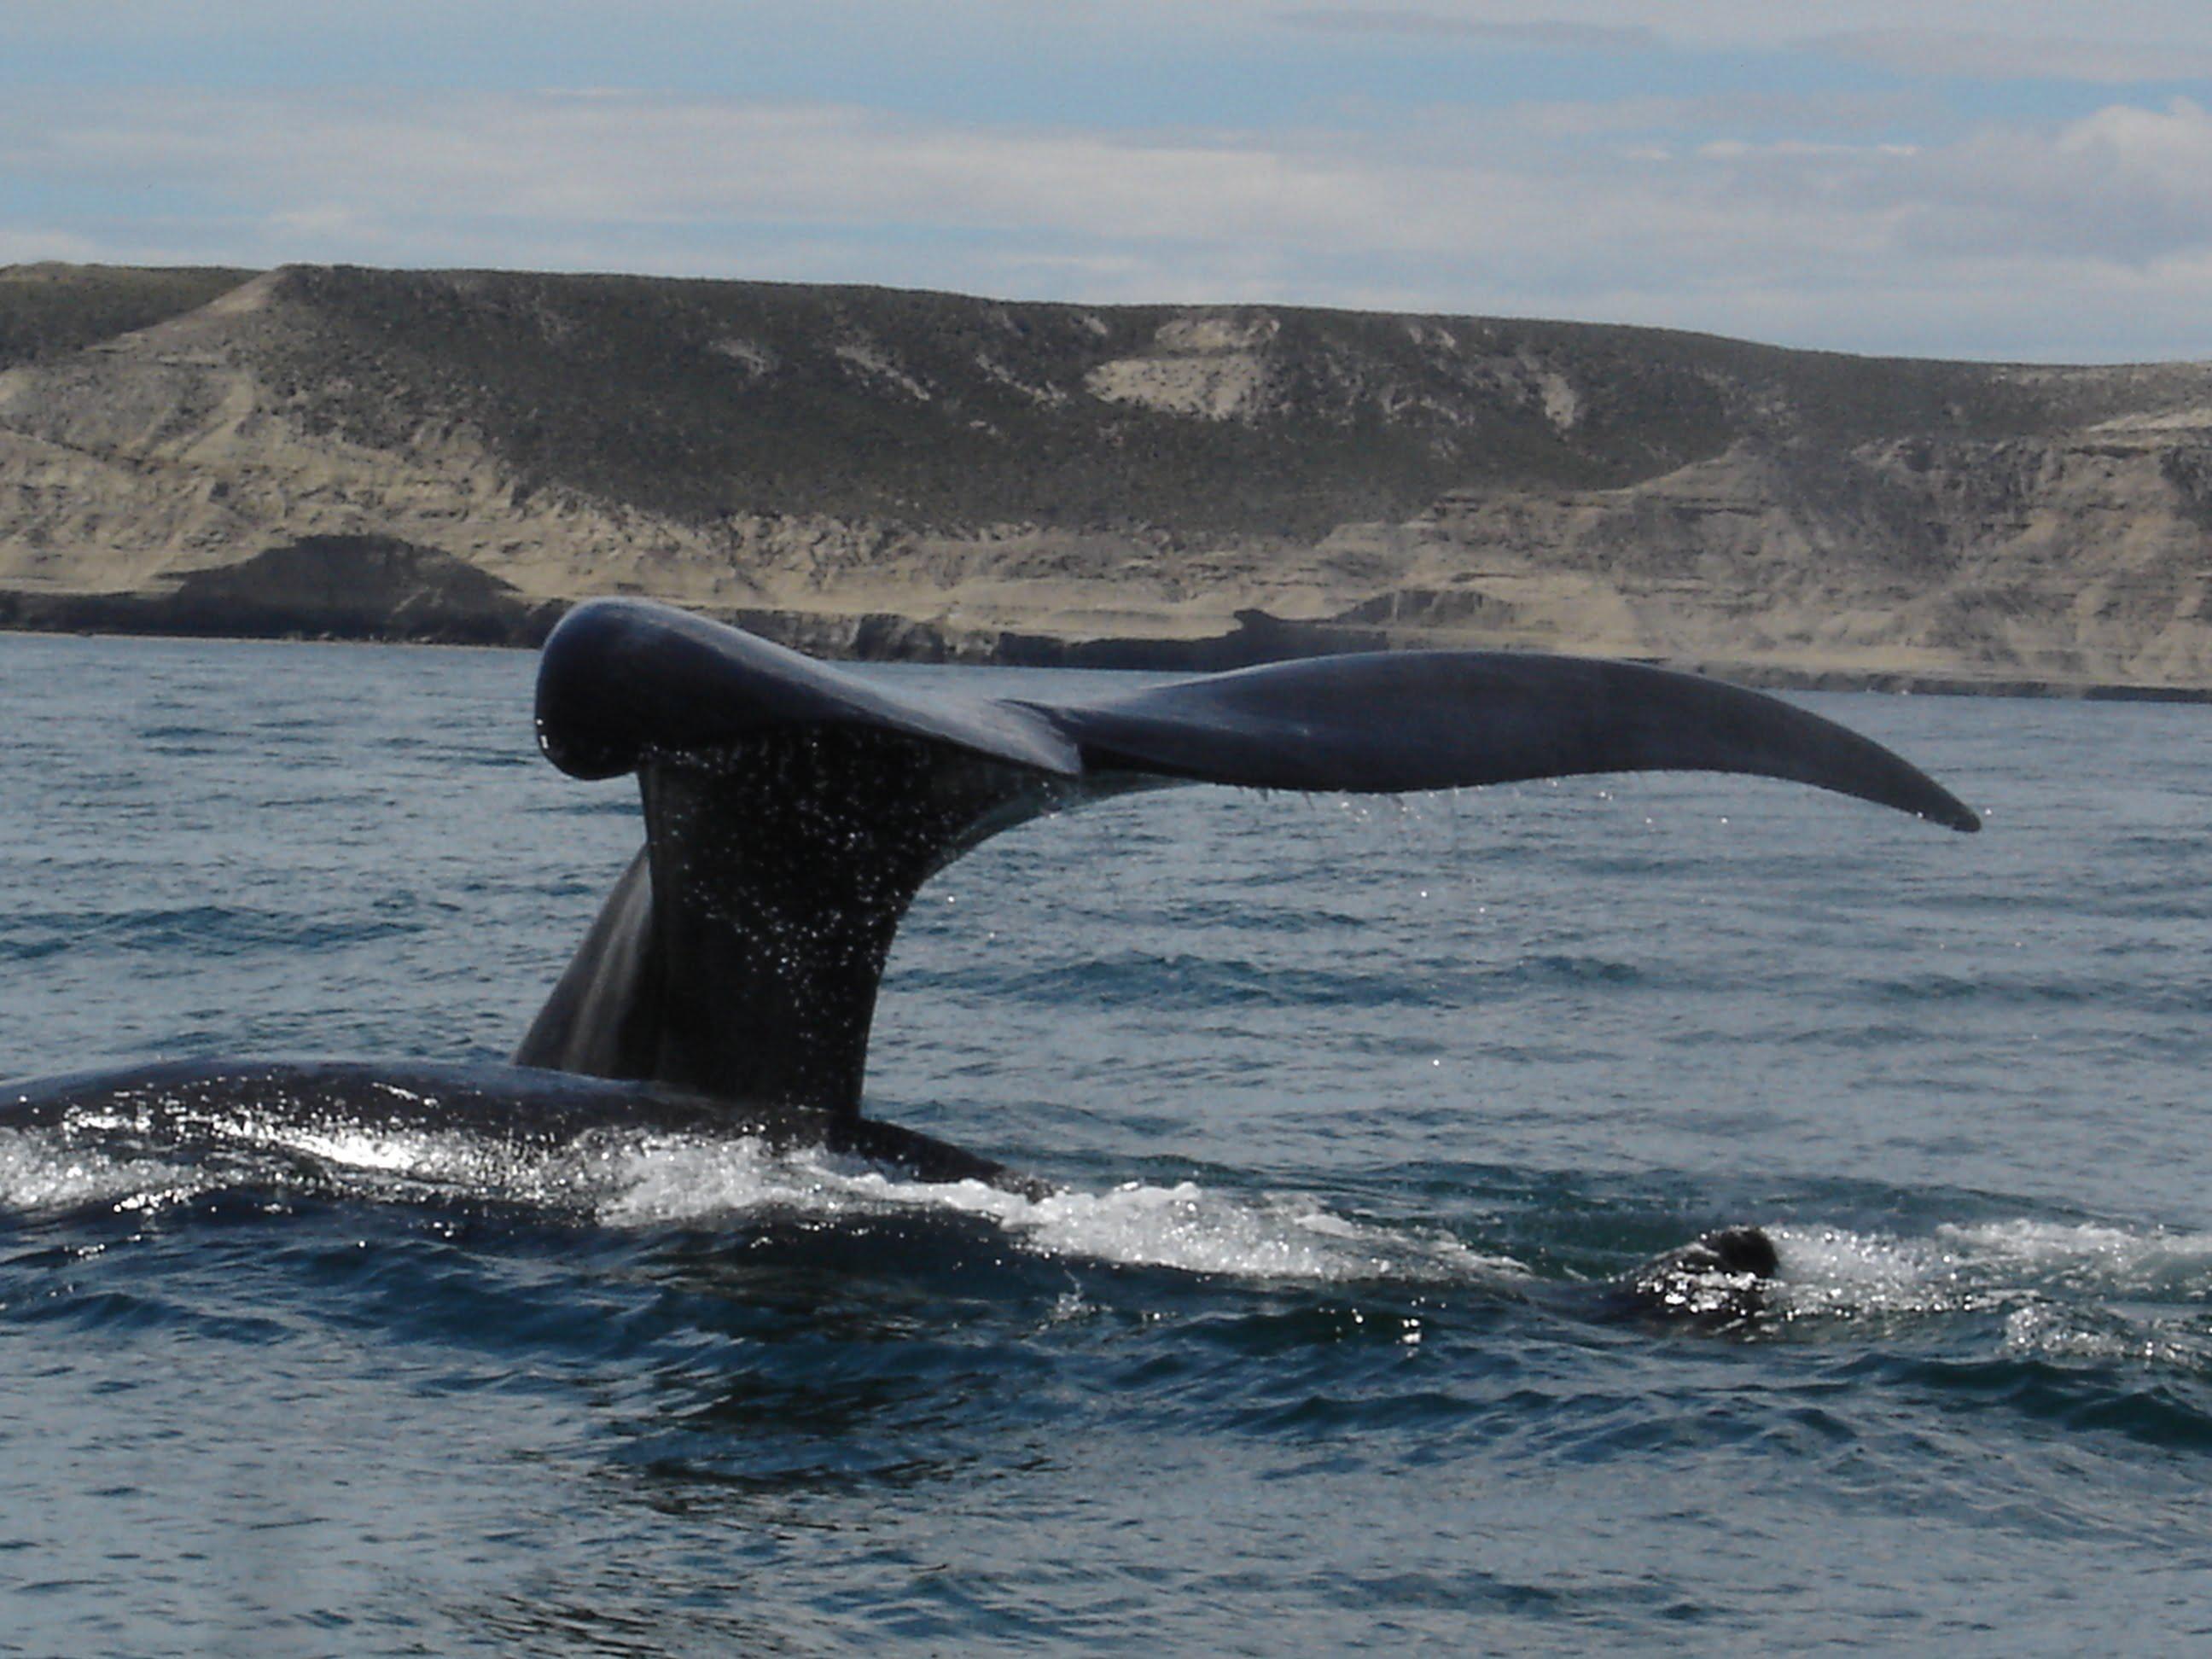 Puerto Madryn - Argentina